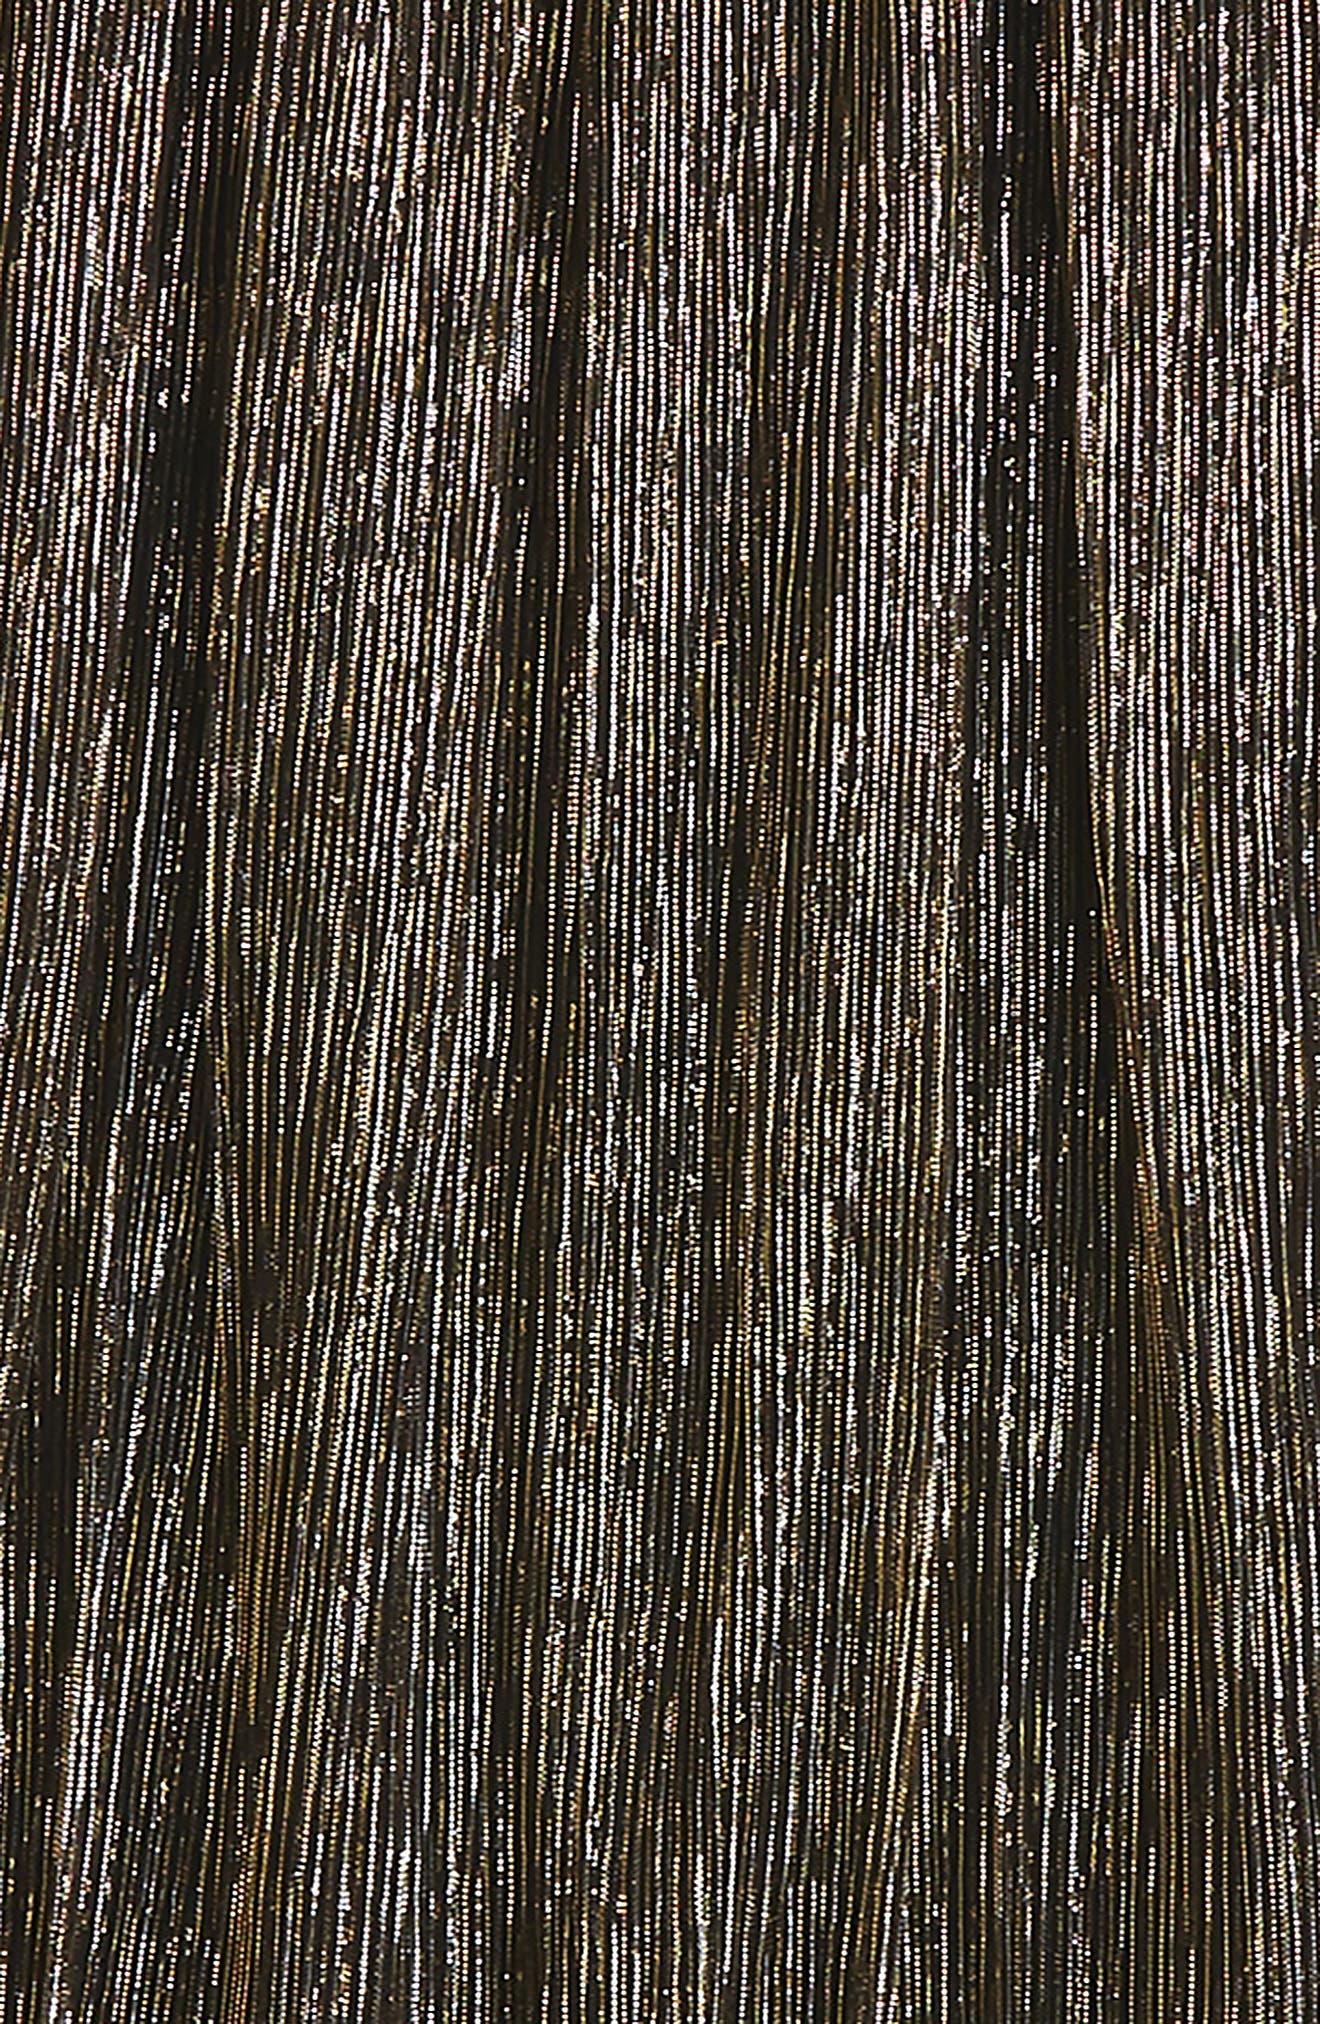 Pleated Metallic Skirt,                             Alternate thumbnail 2, color,                             Black/ Gold